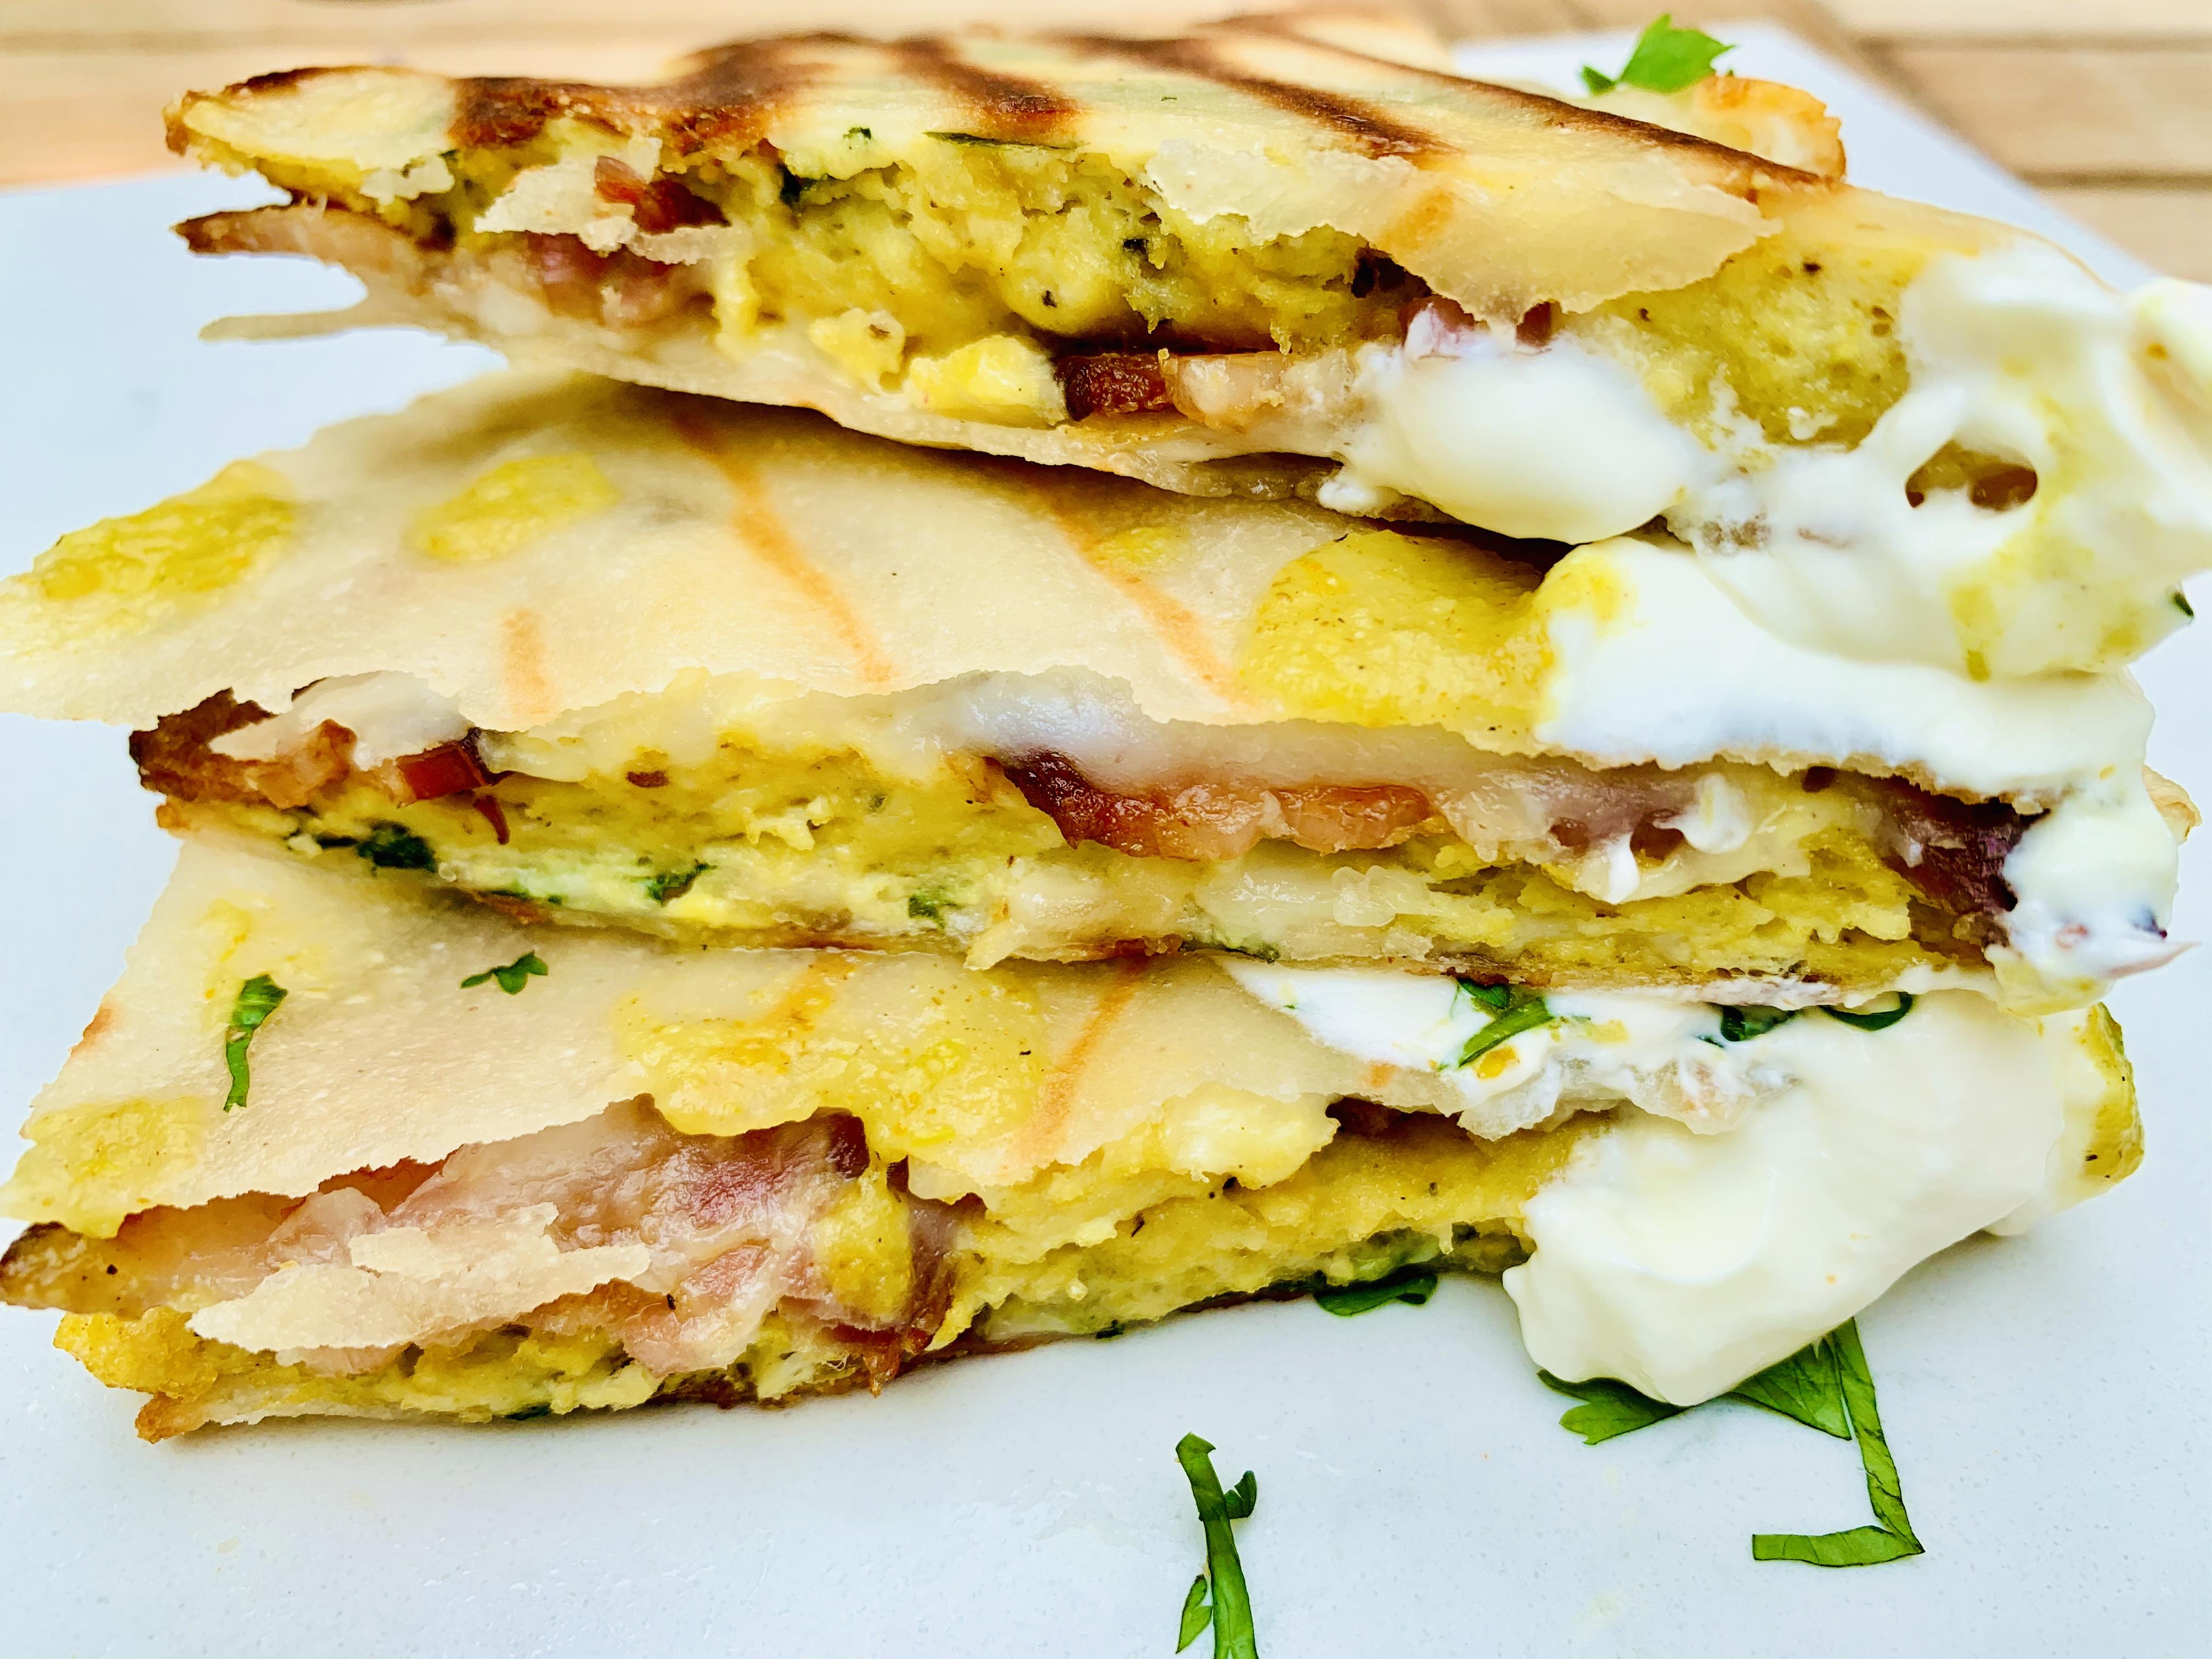 Breakfast Quesadilla stuffed with smoked bacon, green enchilada sauce, sour cream, cilantro and the best siete tortillas. #kenzinthekitch #sproutingvitality #breakfast